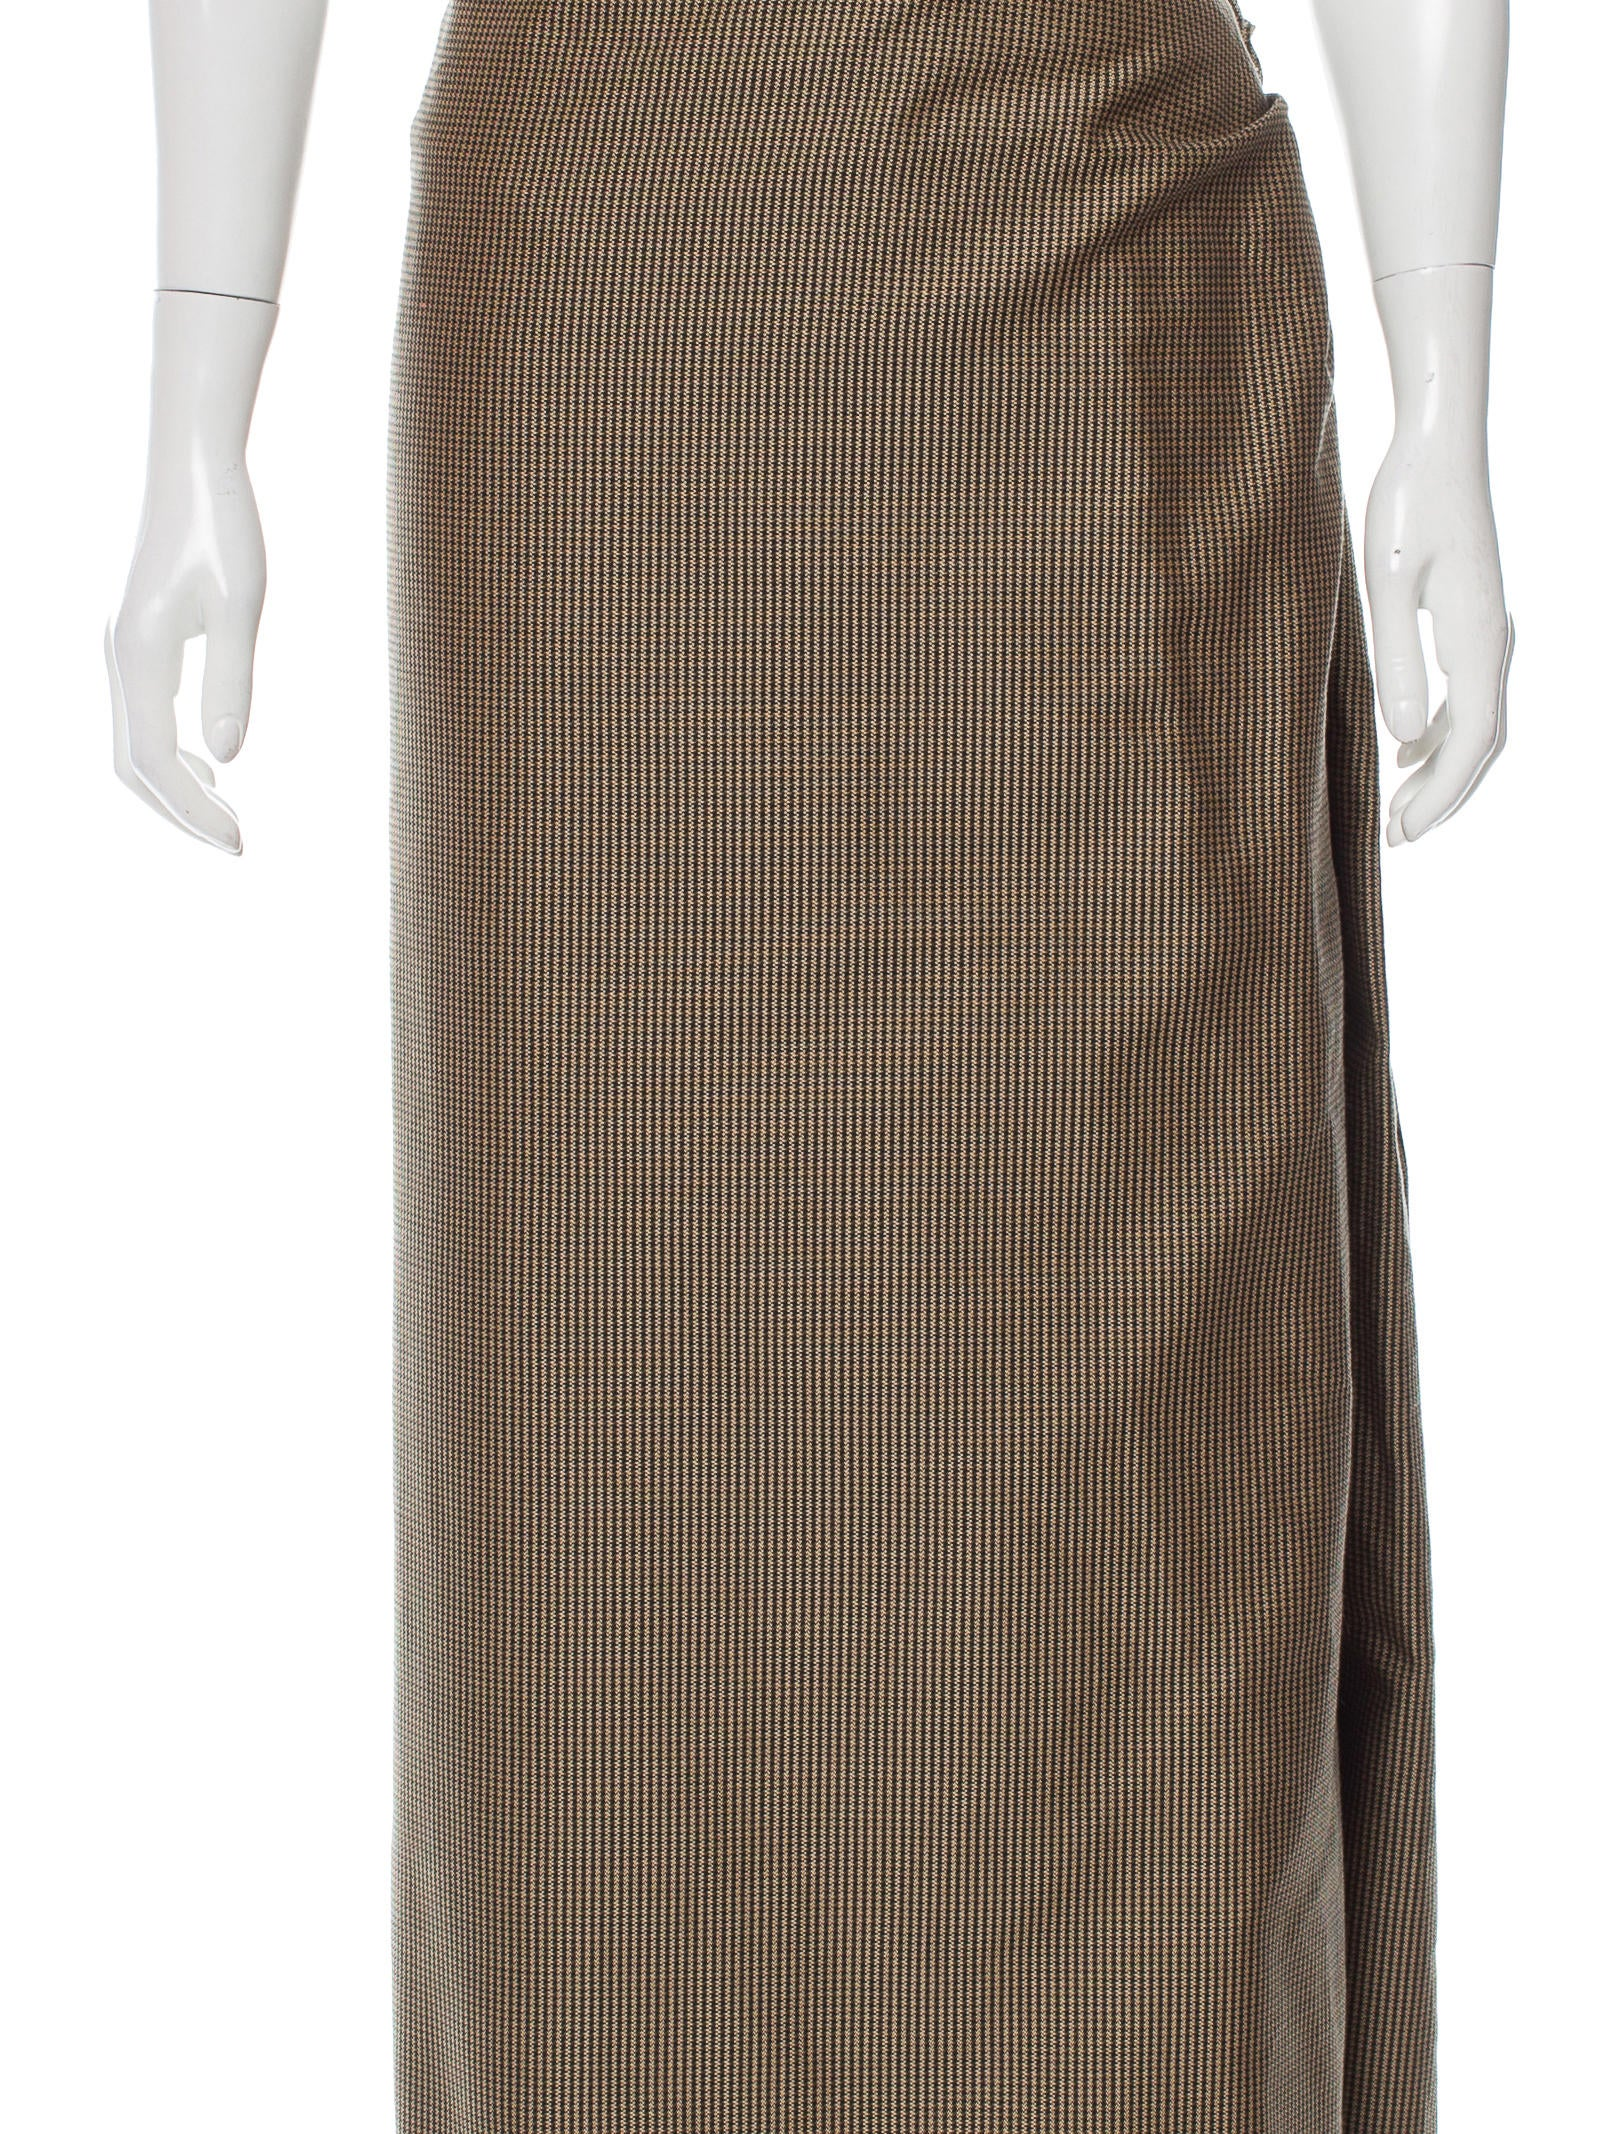 michael kors pattern maxi skirt clothing mic51179